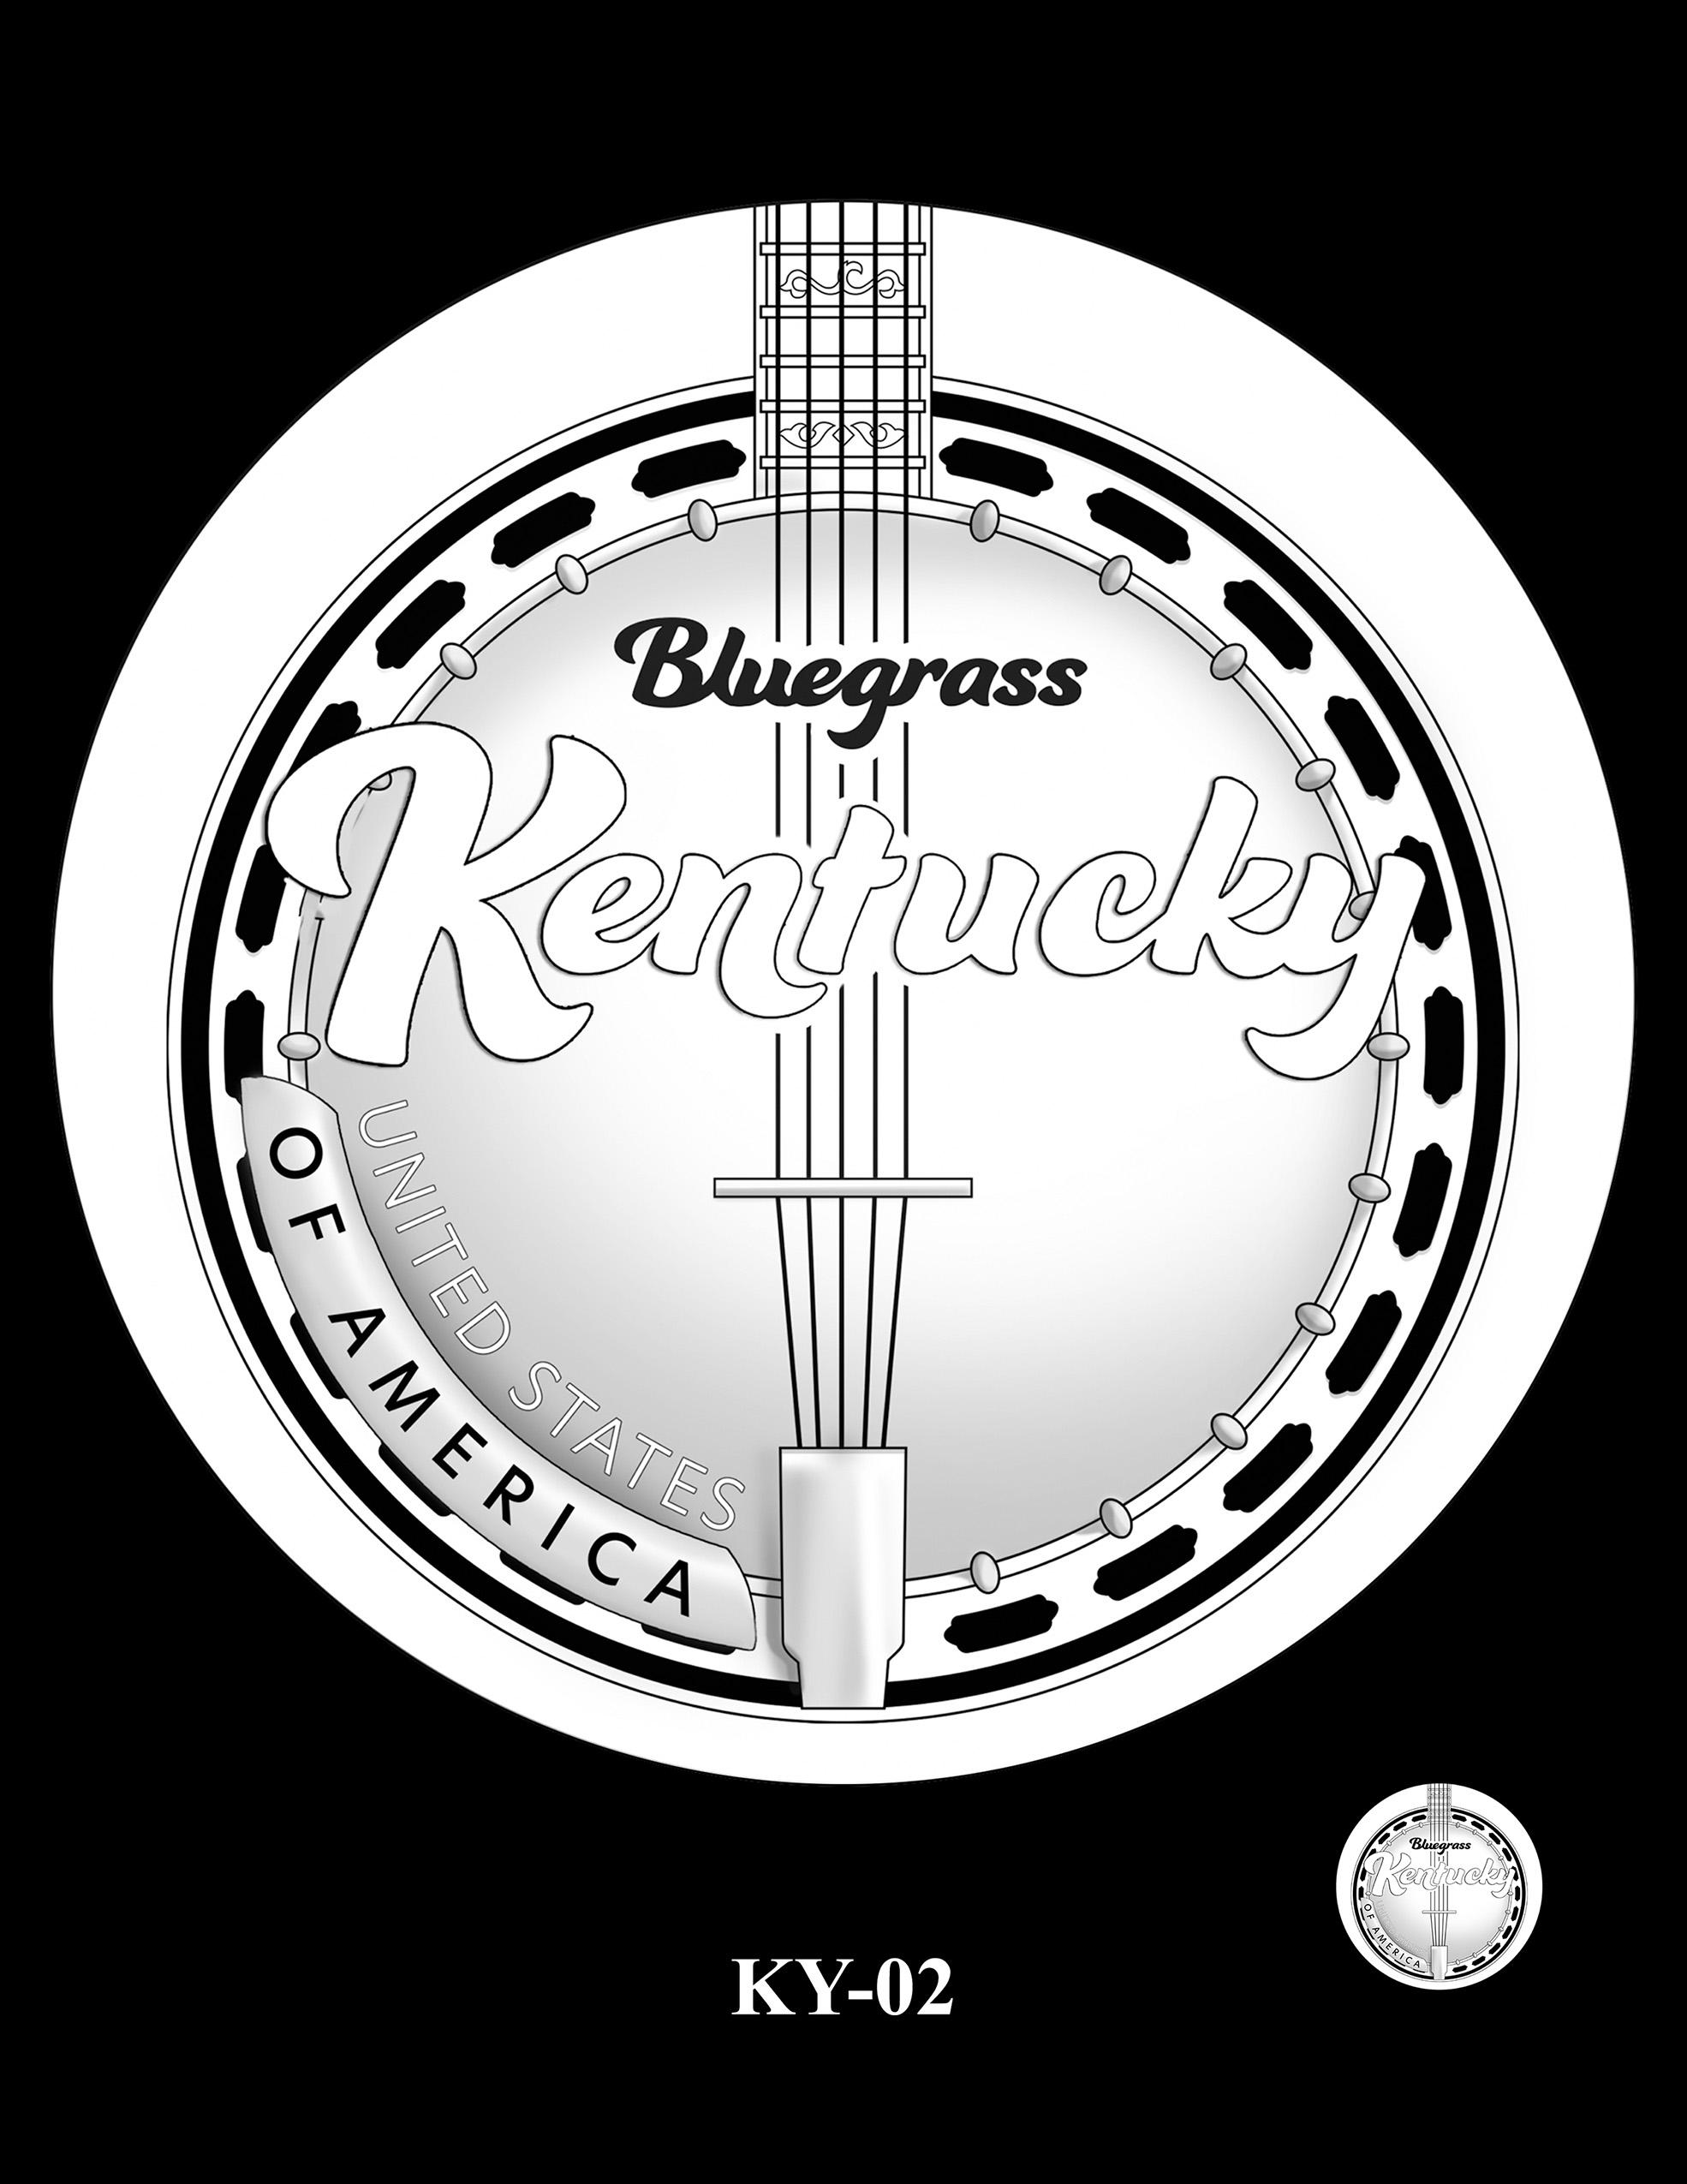 KY-02 -- 2022 American Innovation $1 Coin - Kentucky